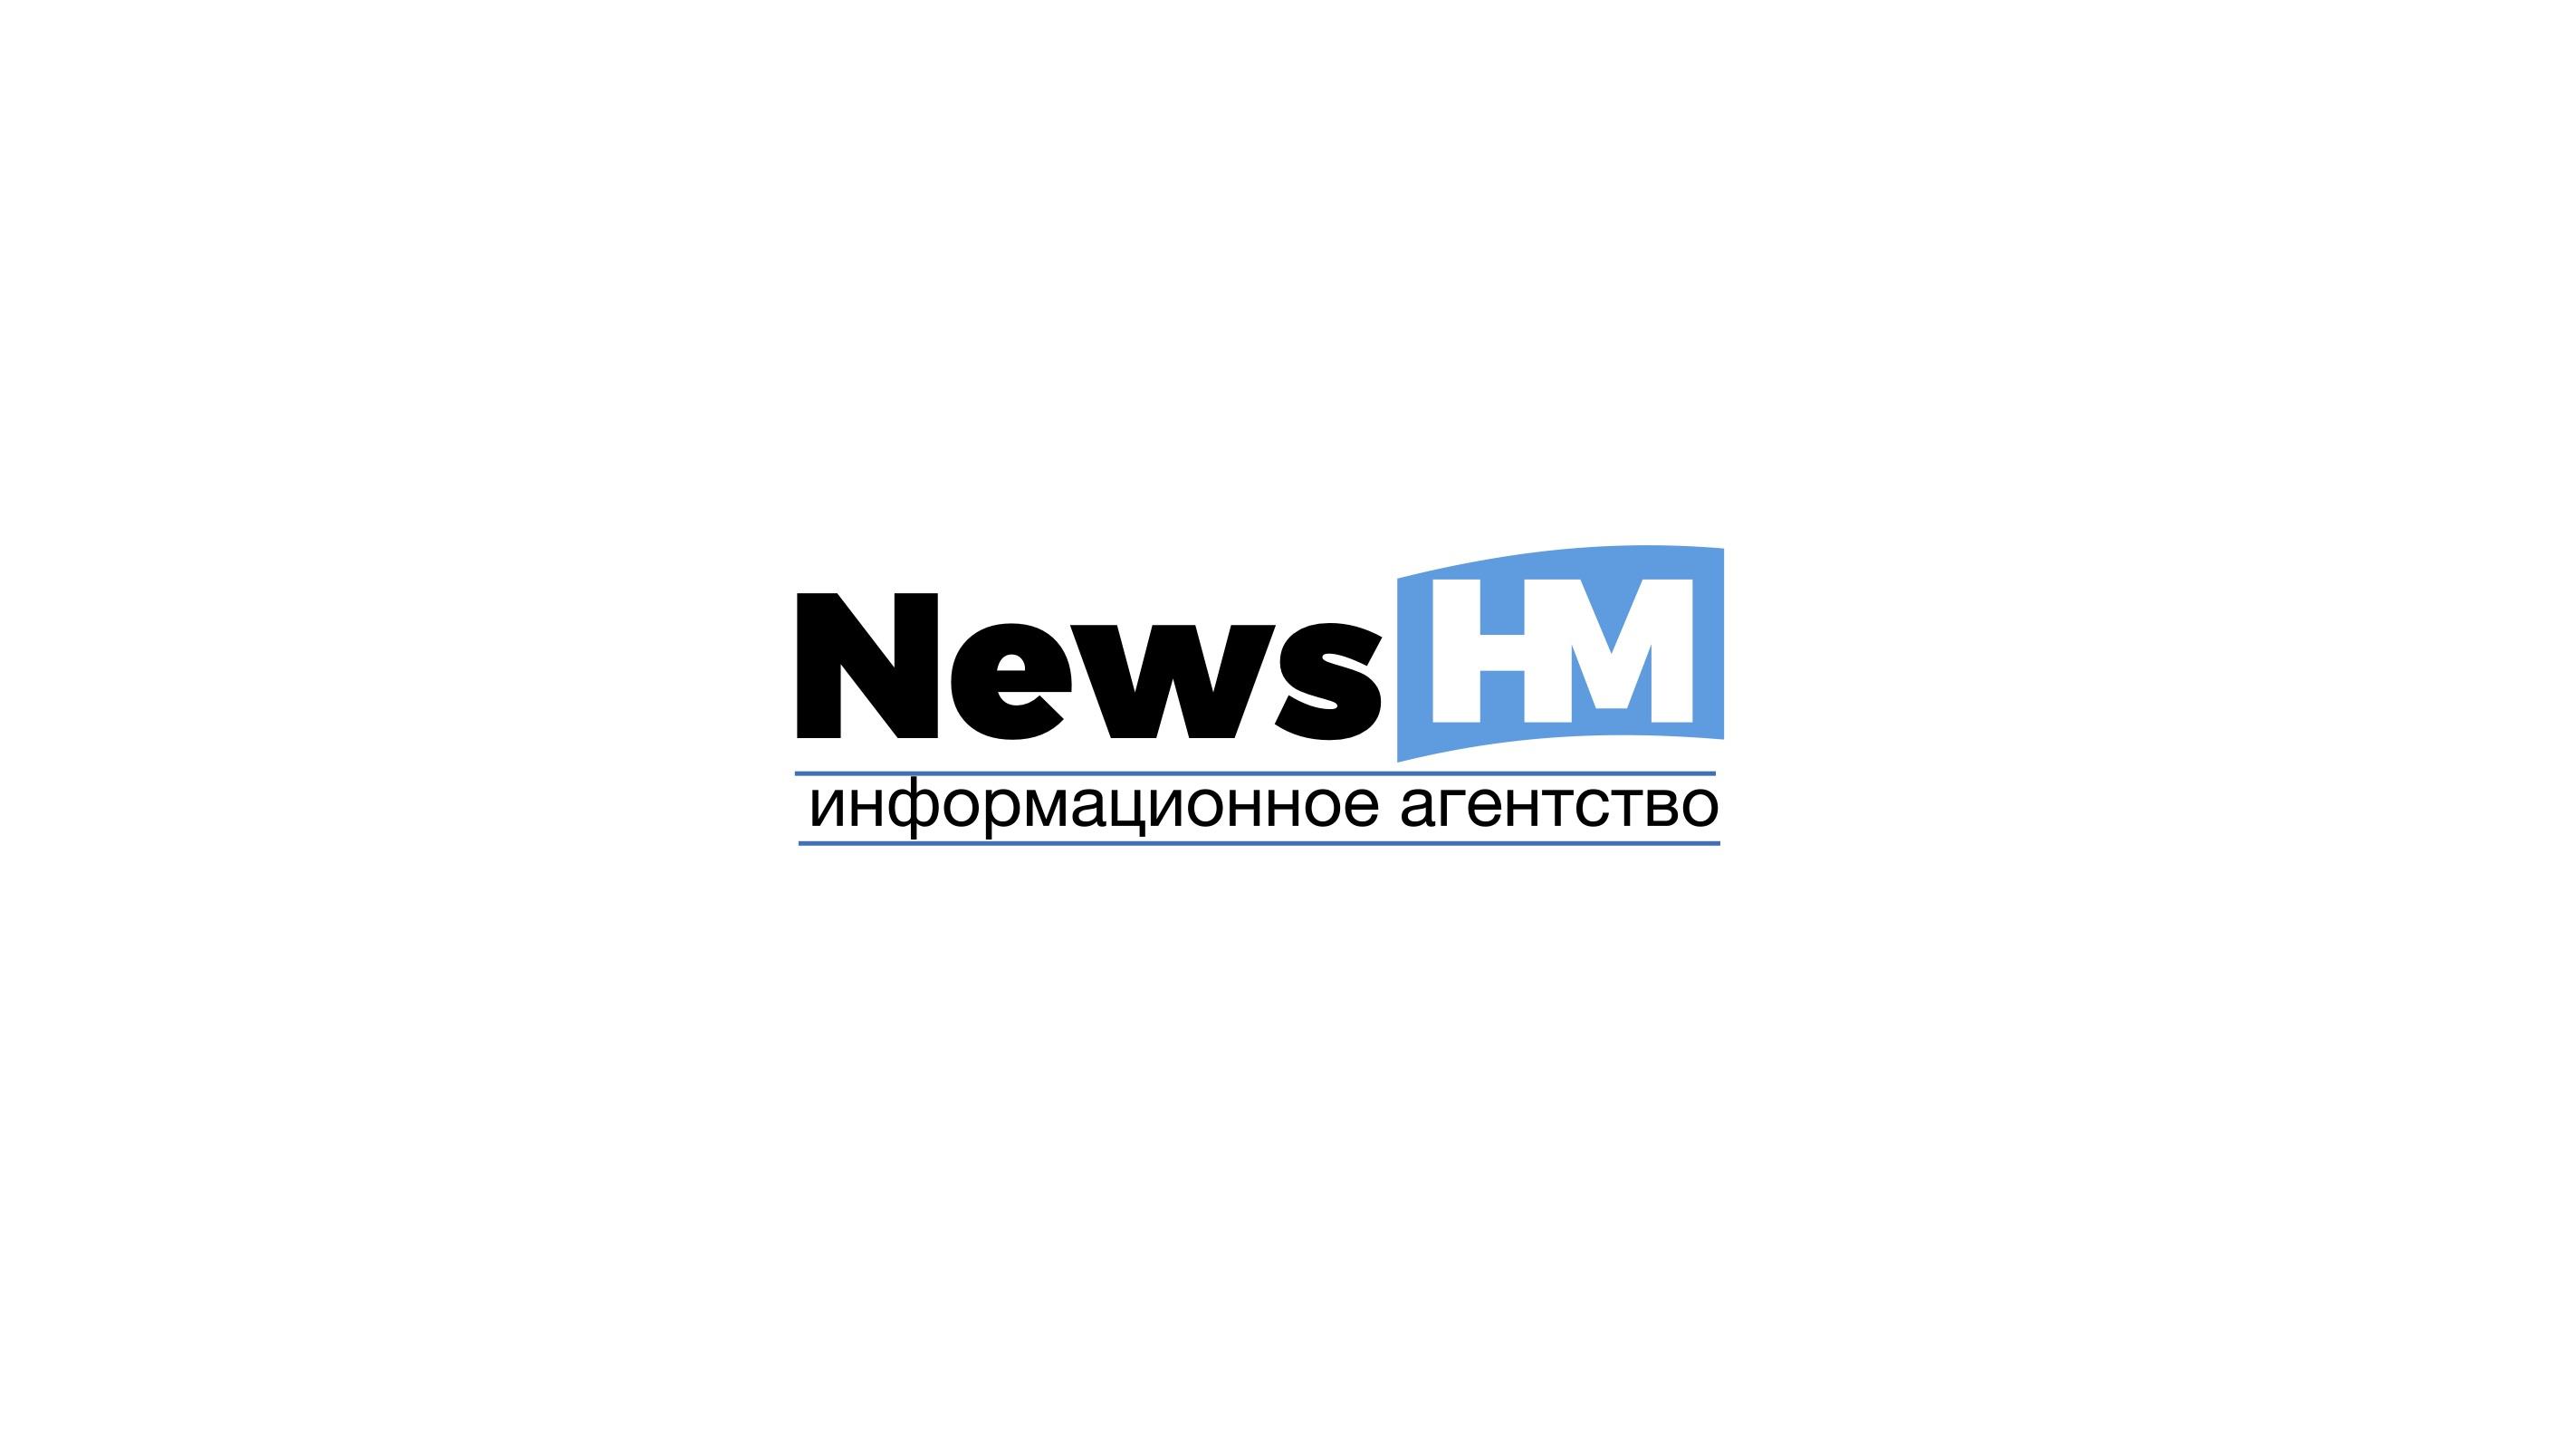 Логотип для информационного агентства фото f_8645aa728908e73e.jpg